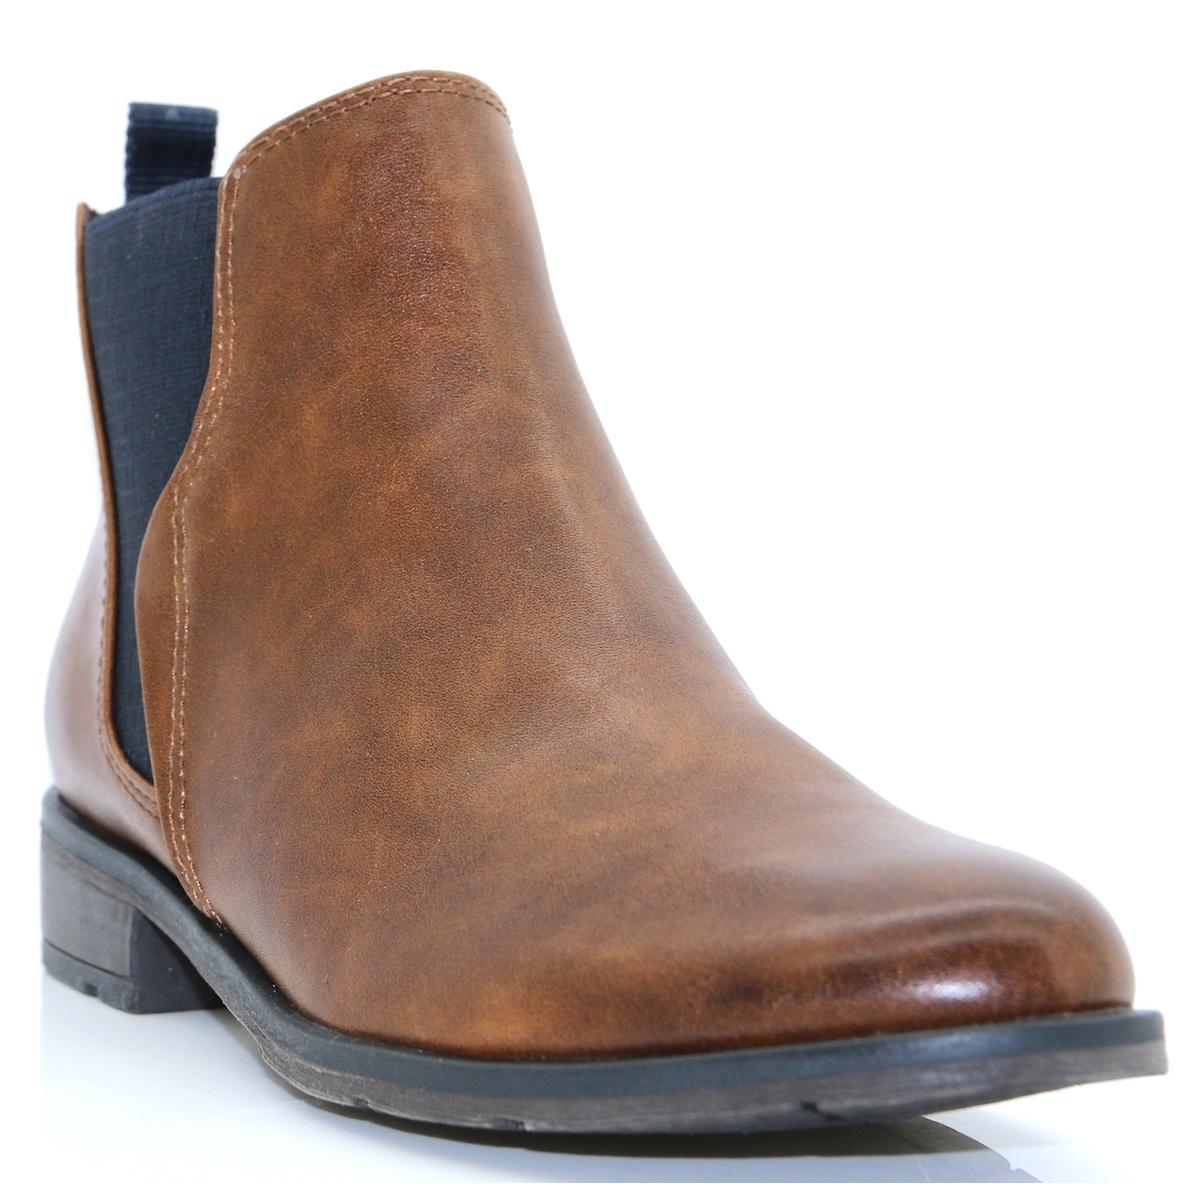 25040 29 marco tozzi cognac chelsea boots. Black Bedroom Furniture Sets. Home Design Ideas